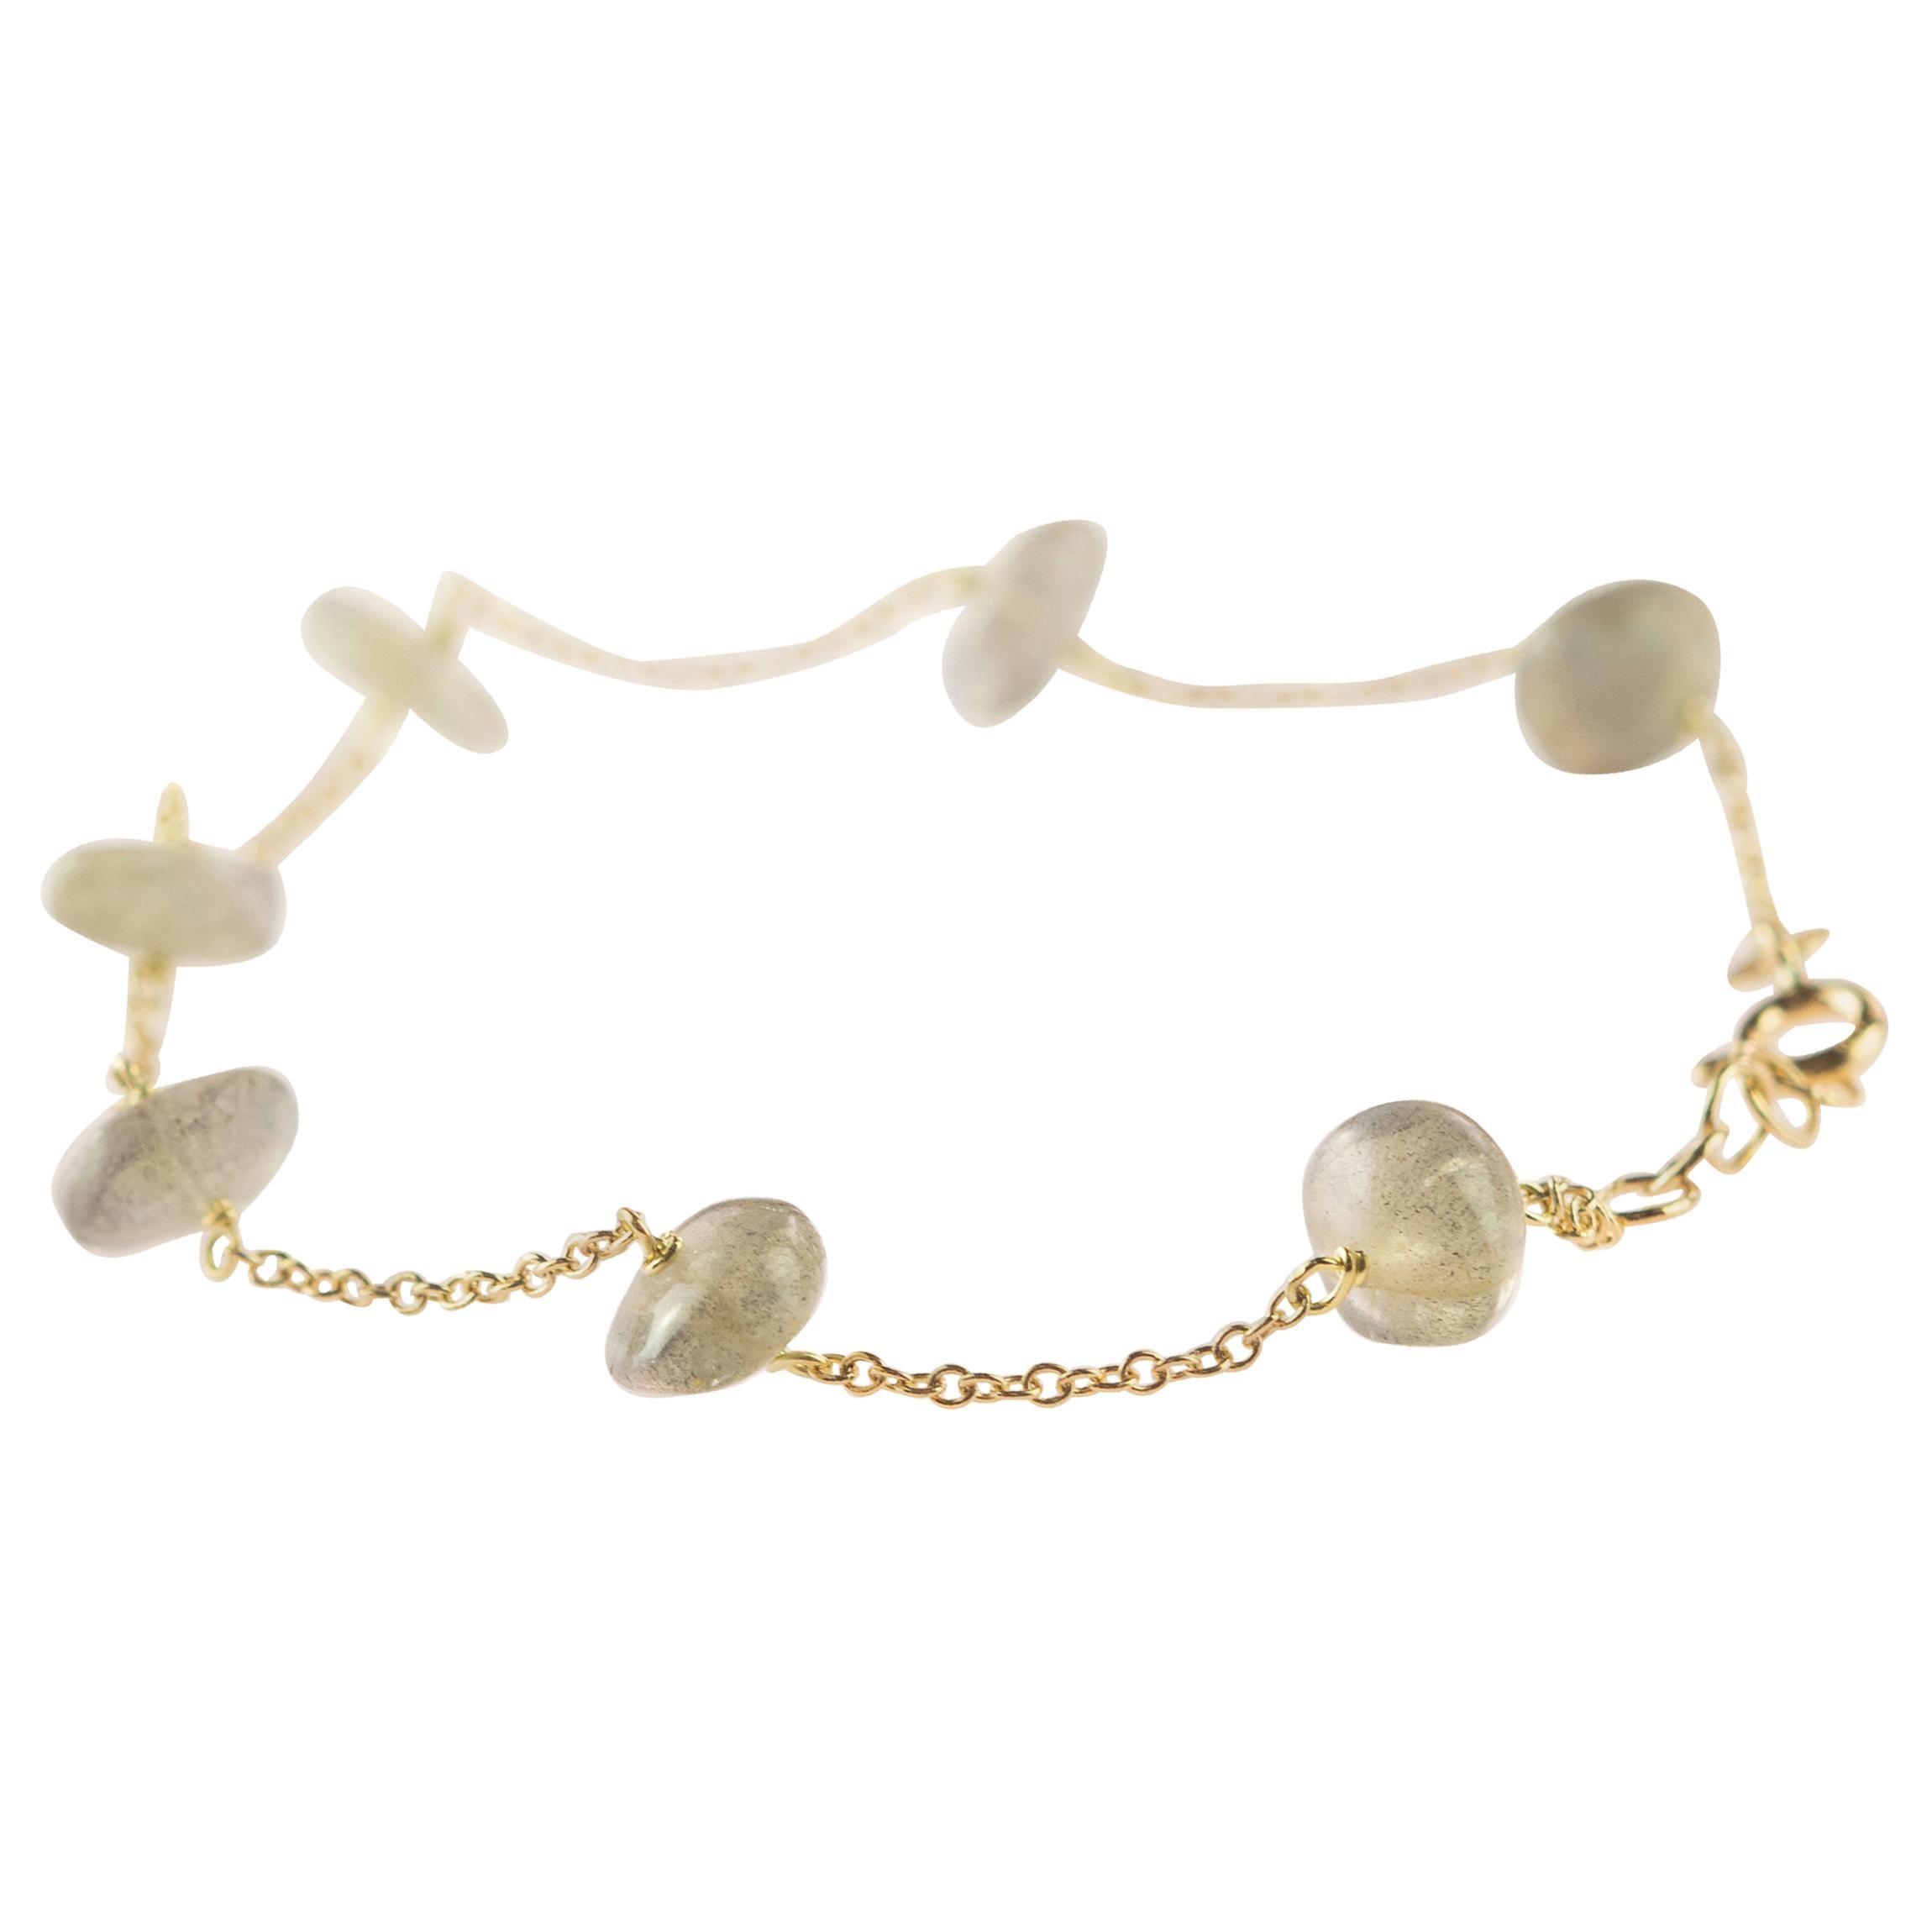 Intini Jewes 9 Karat Gold Chain Cat's Eye Rondelles Handmade Anklet Bracelet